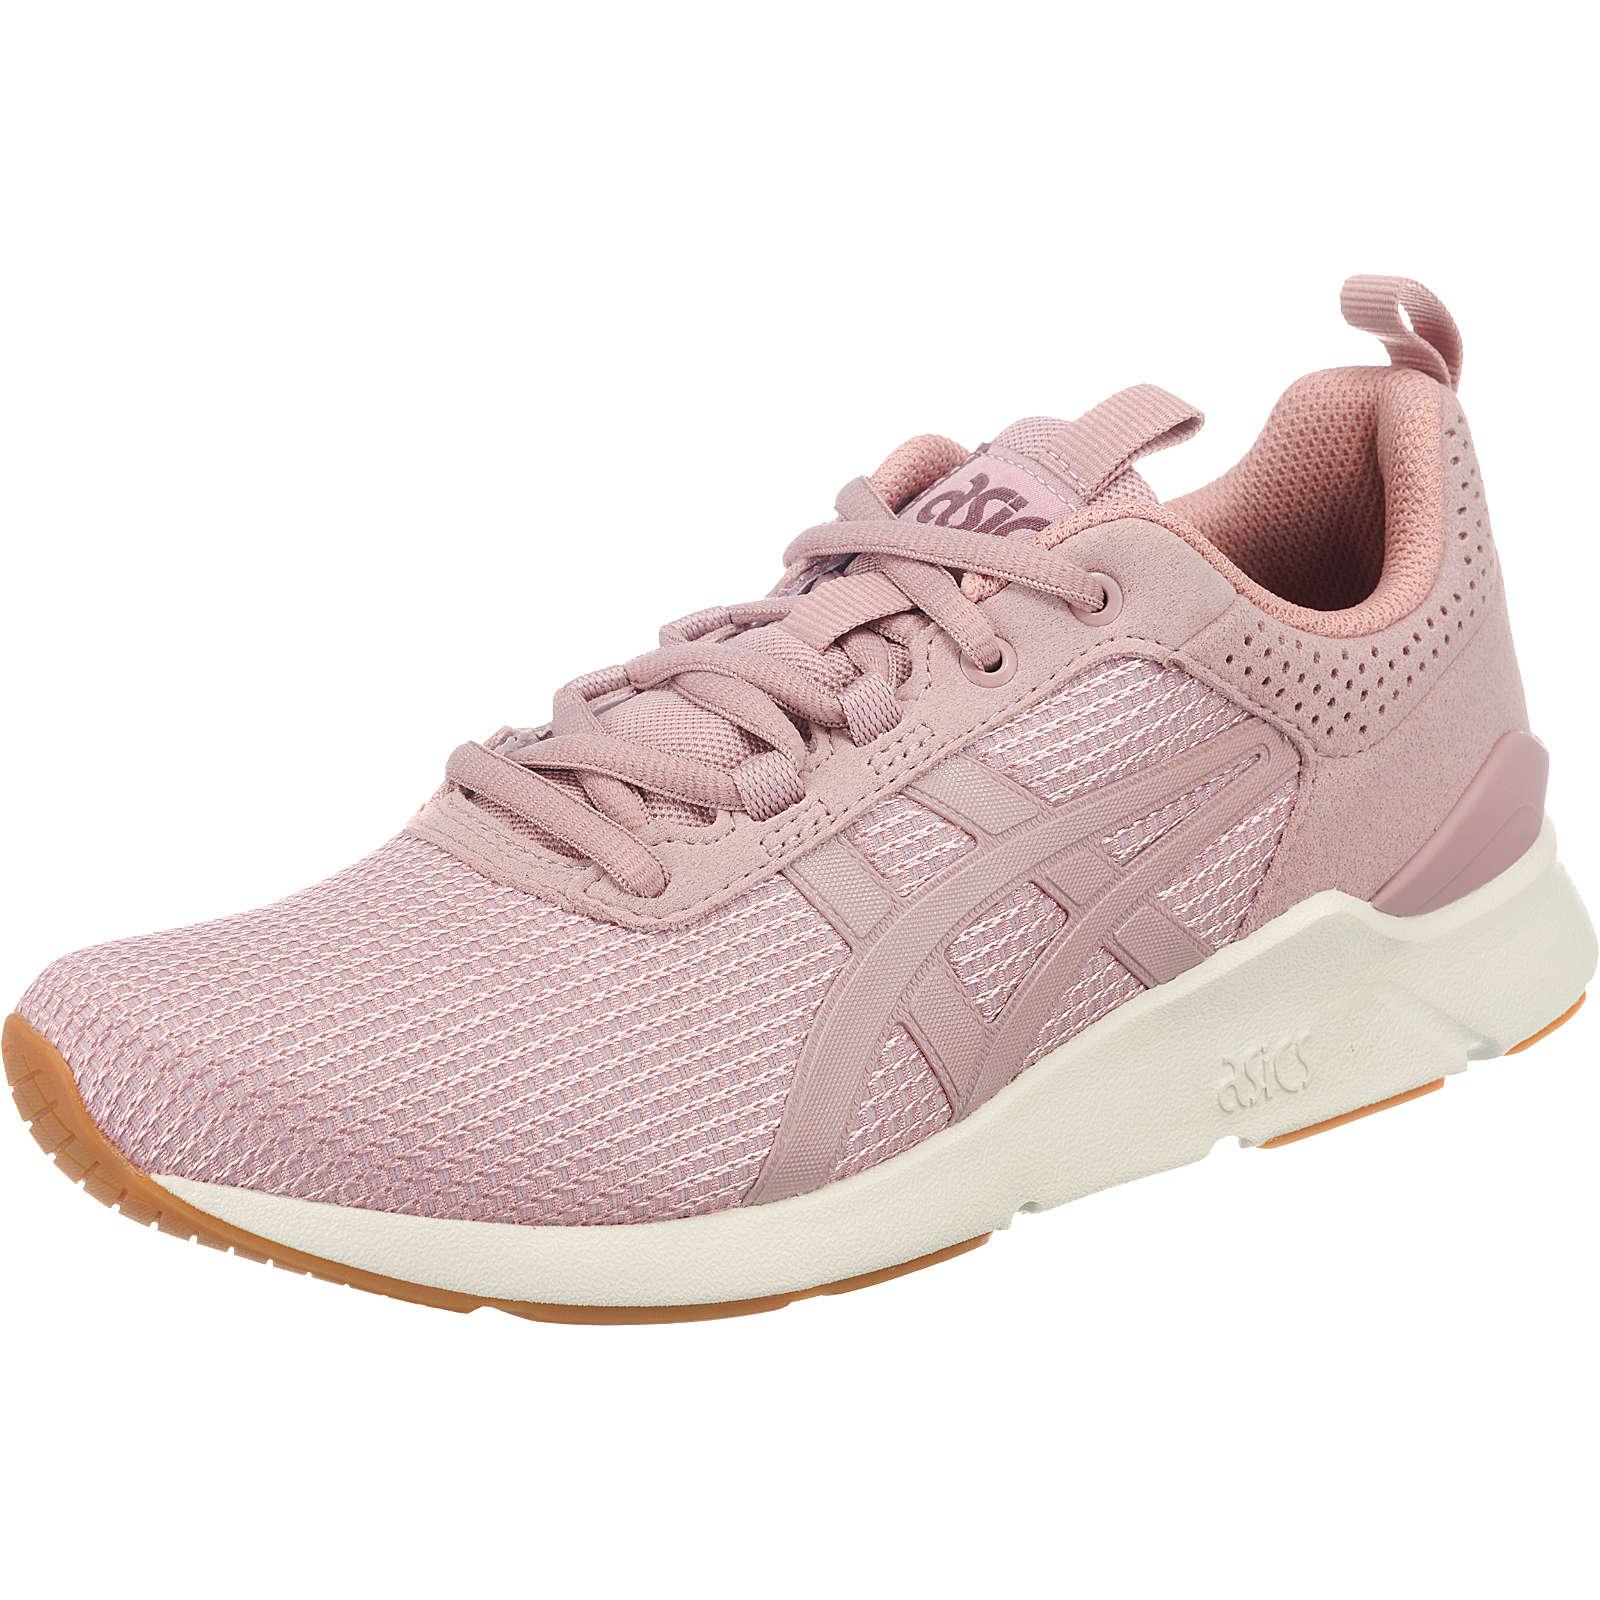 ASICS Tiger GEL-LYTE RUNNER Sneakers Low rosa Damen Gr. 37